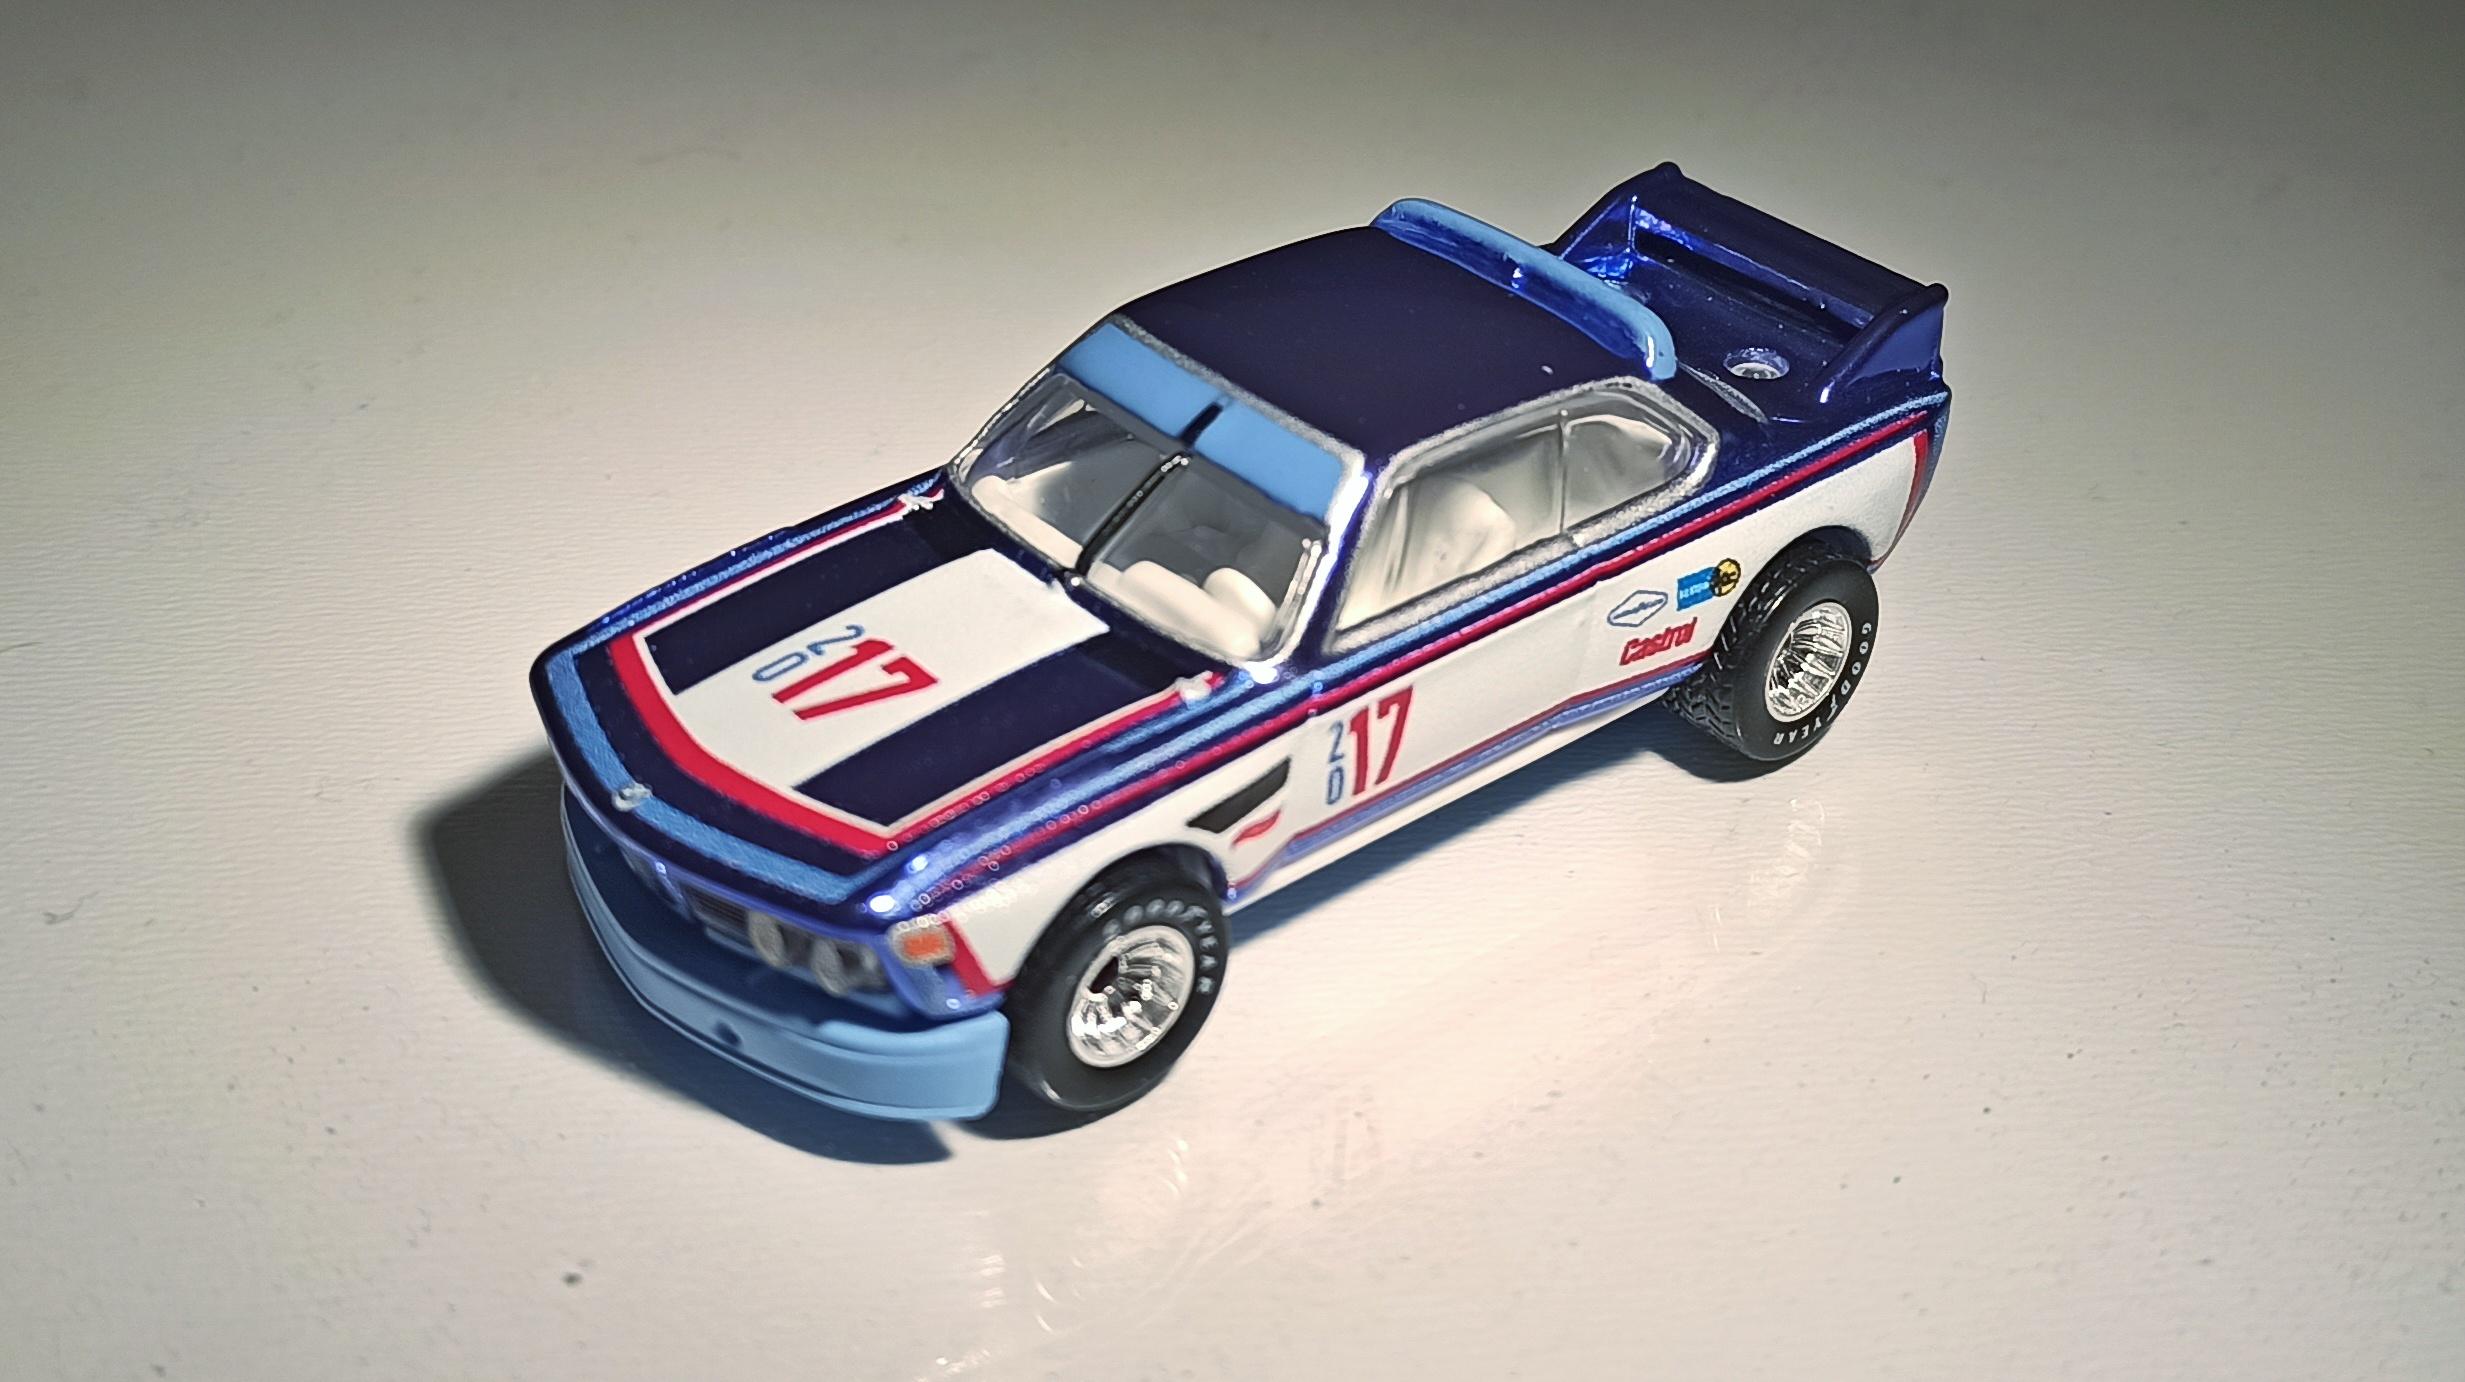 Hot Wheels '73 BMW 3.0 CSL Race Car 2016 Toy Fair spectraflame blue top angle